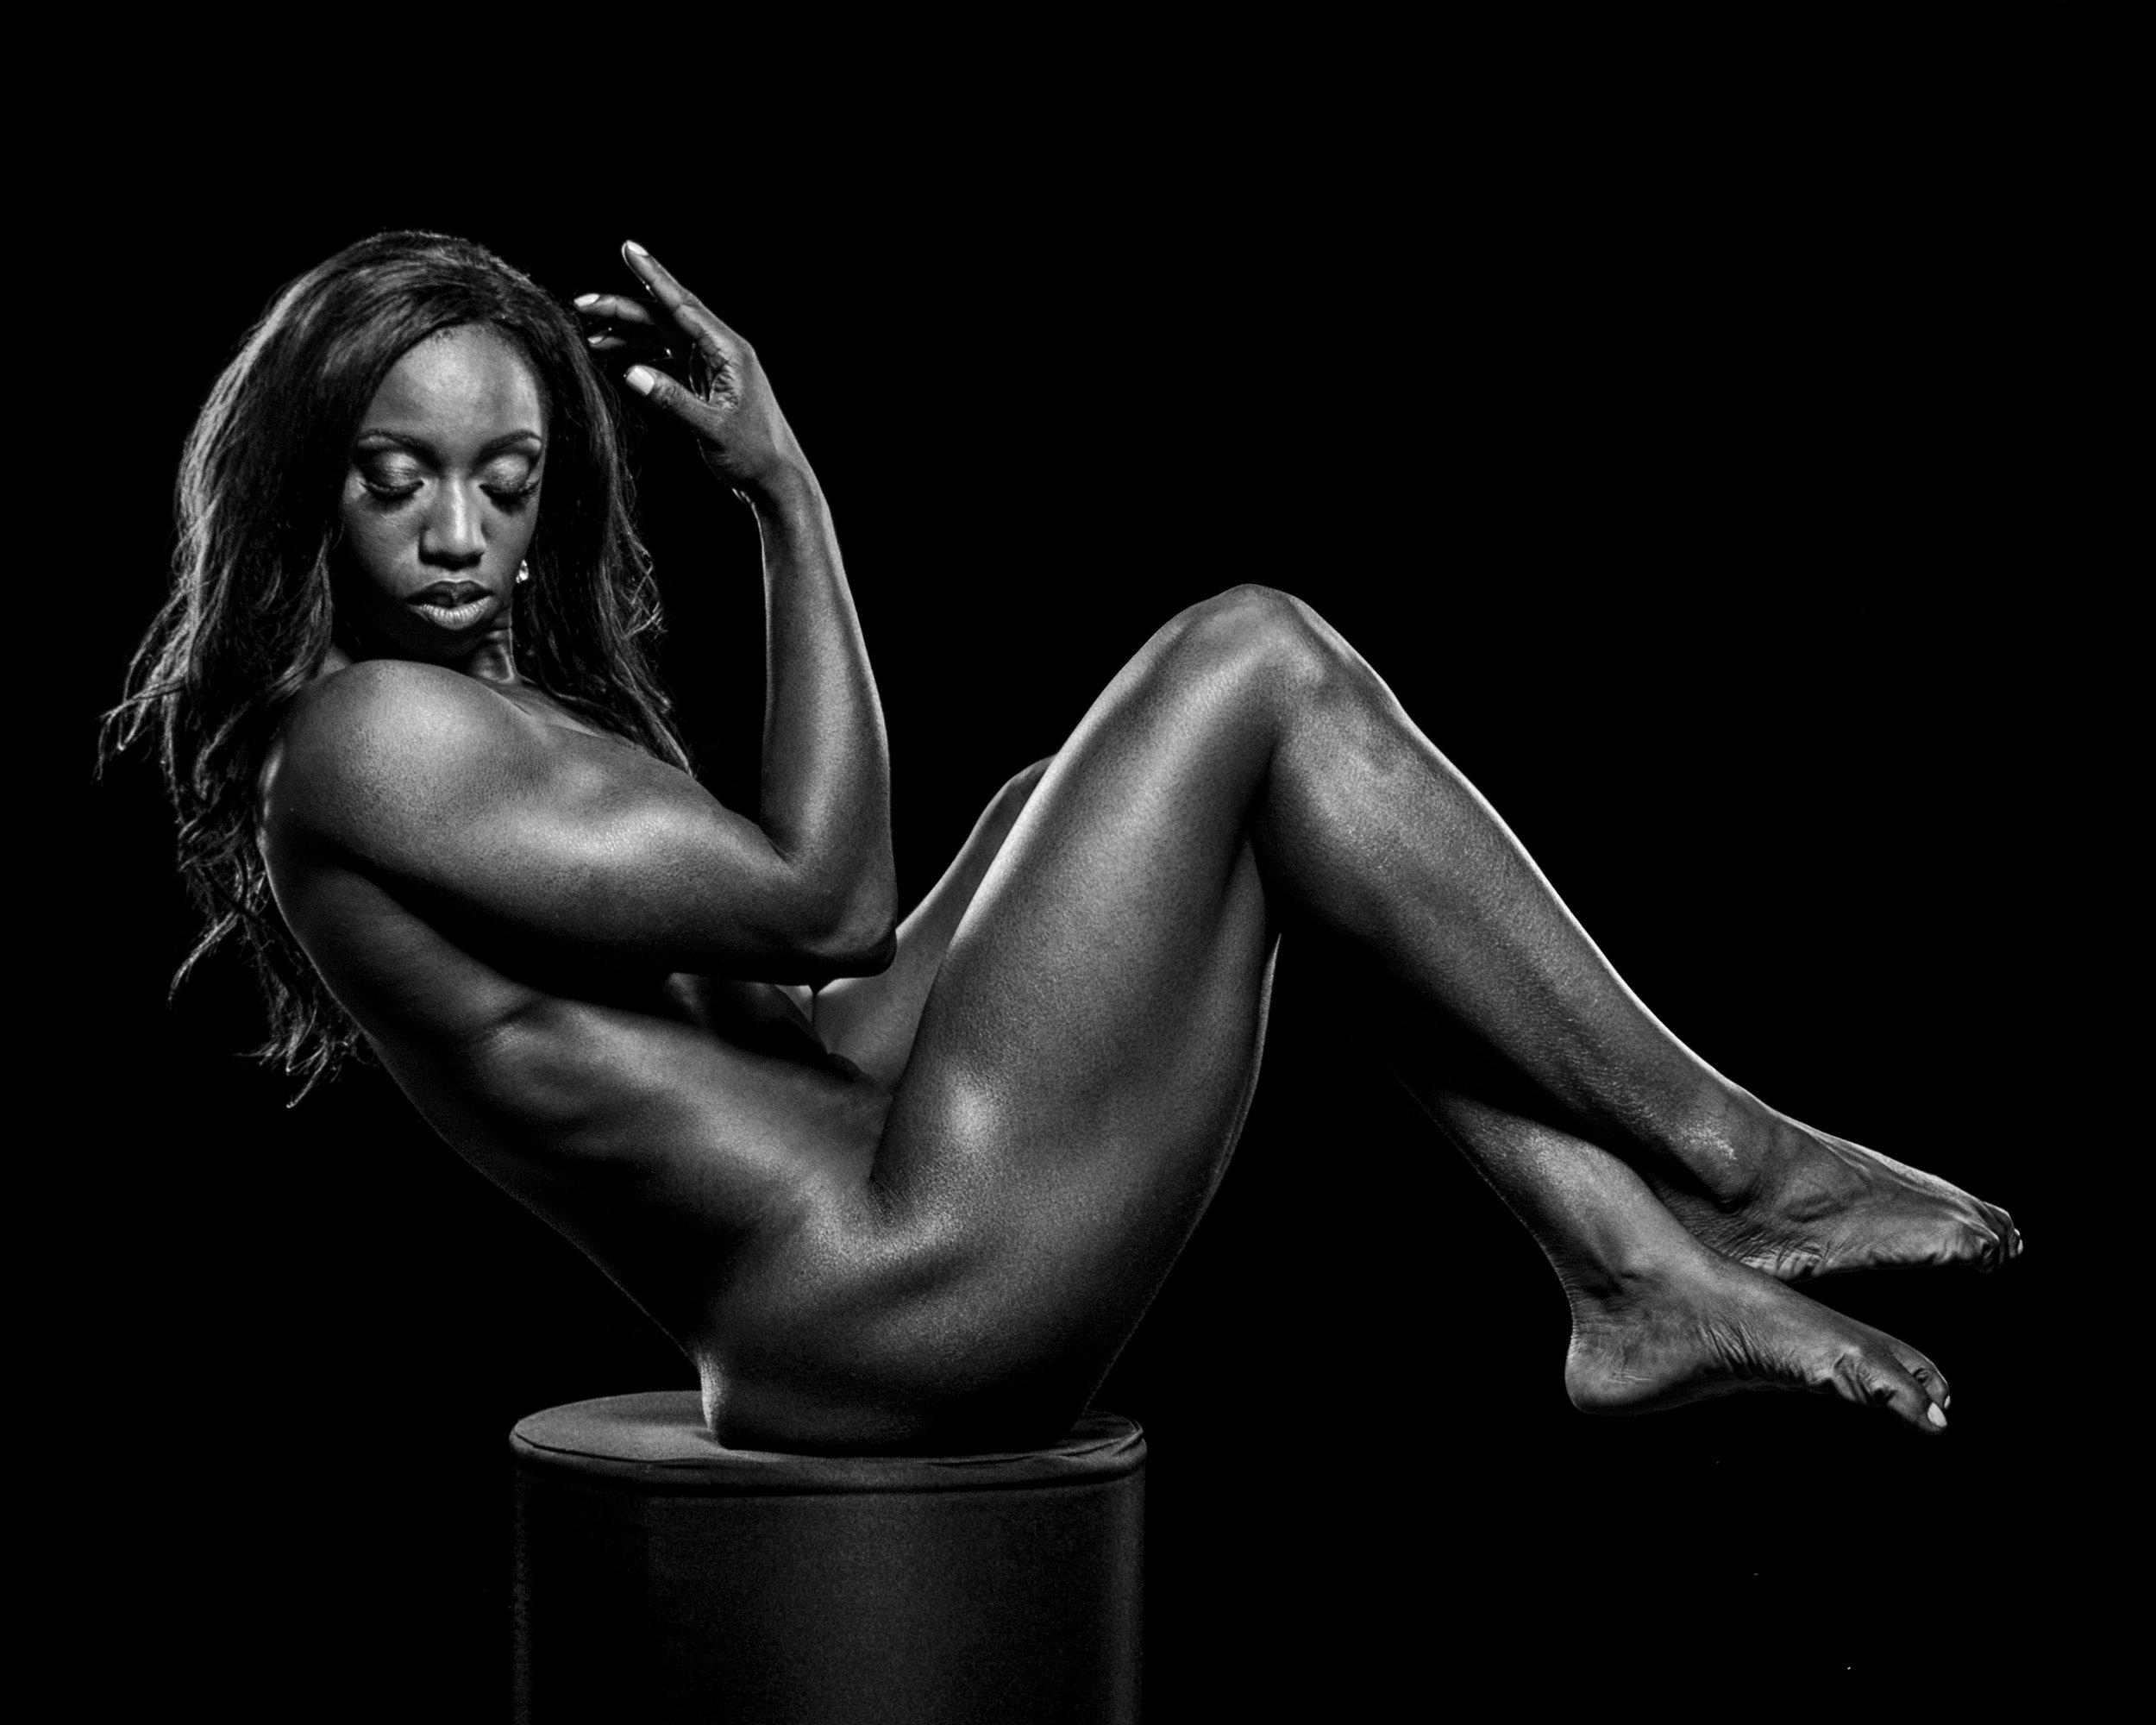 black-woman-bodybuilder-posing-on-block